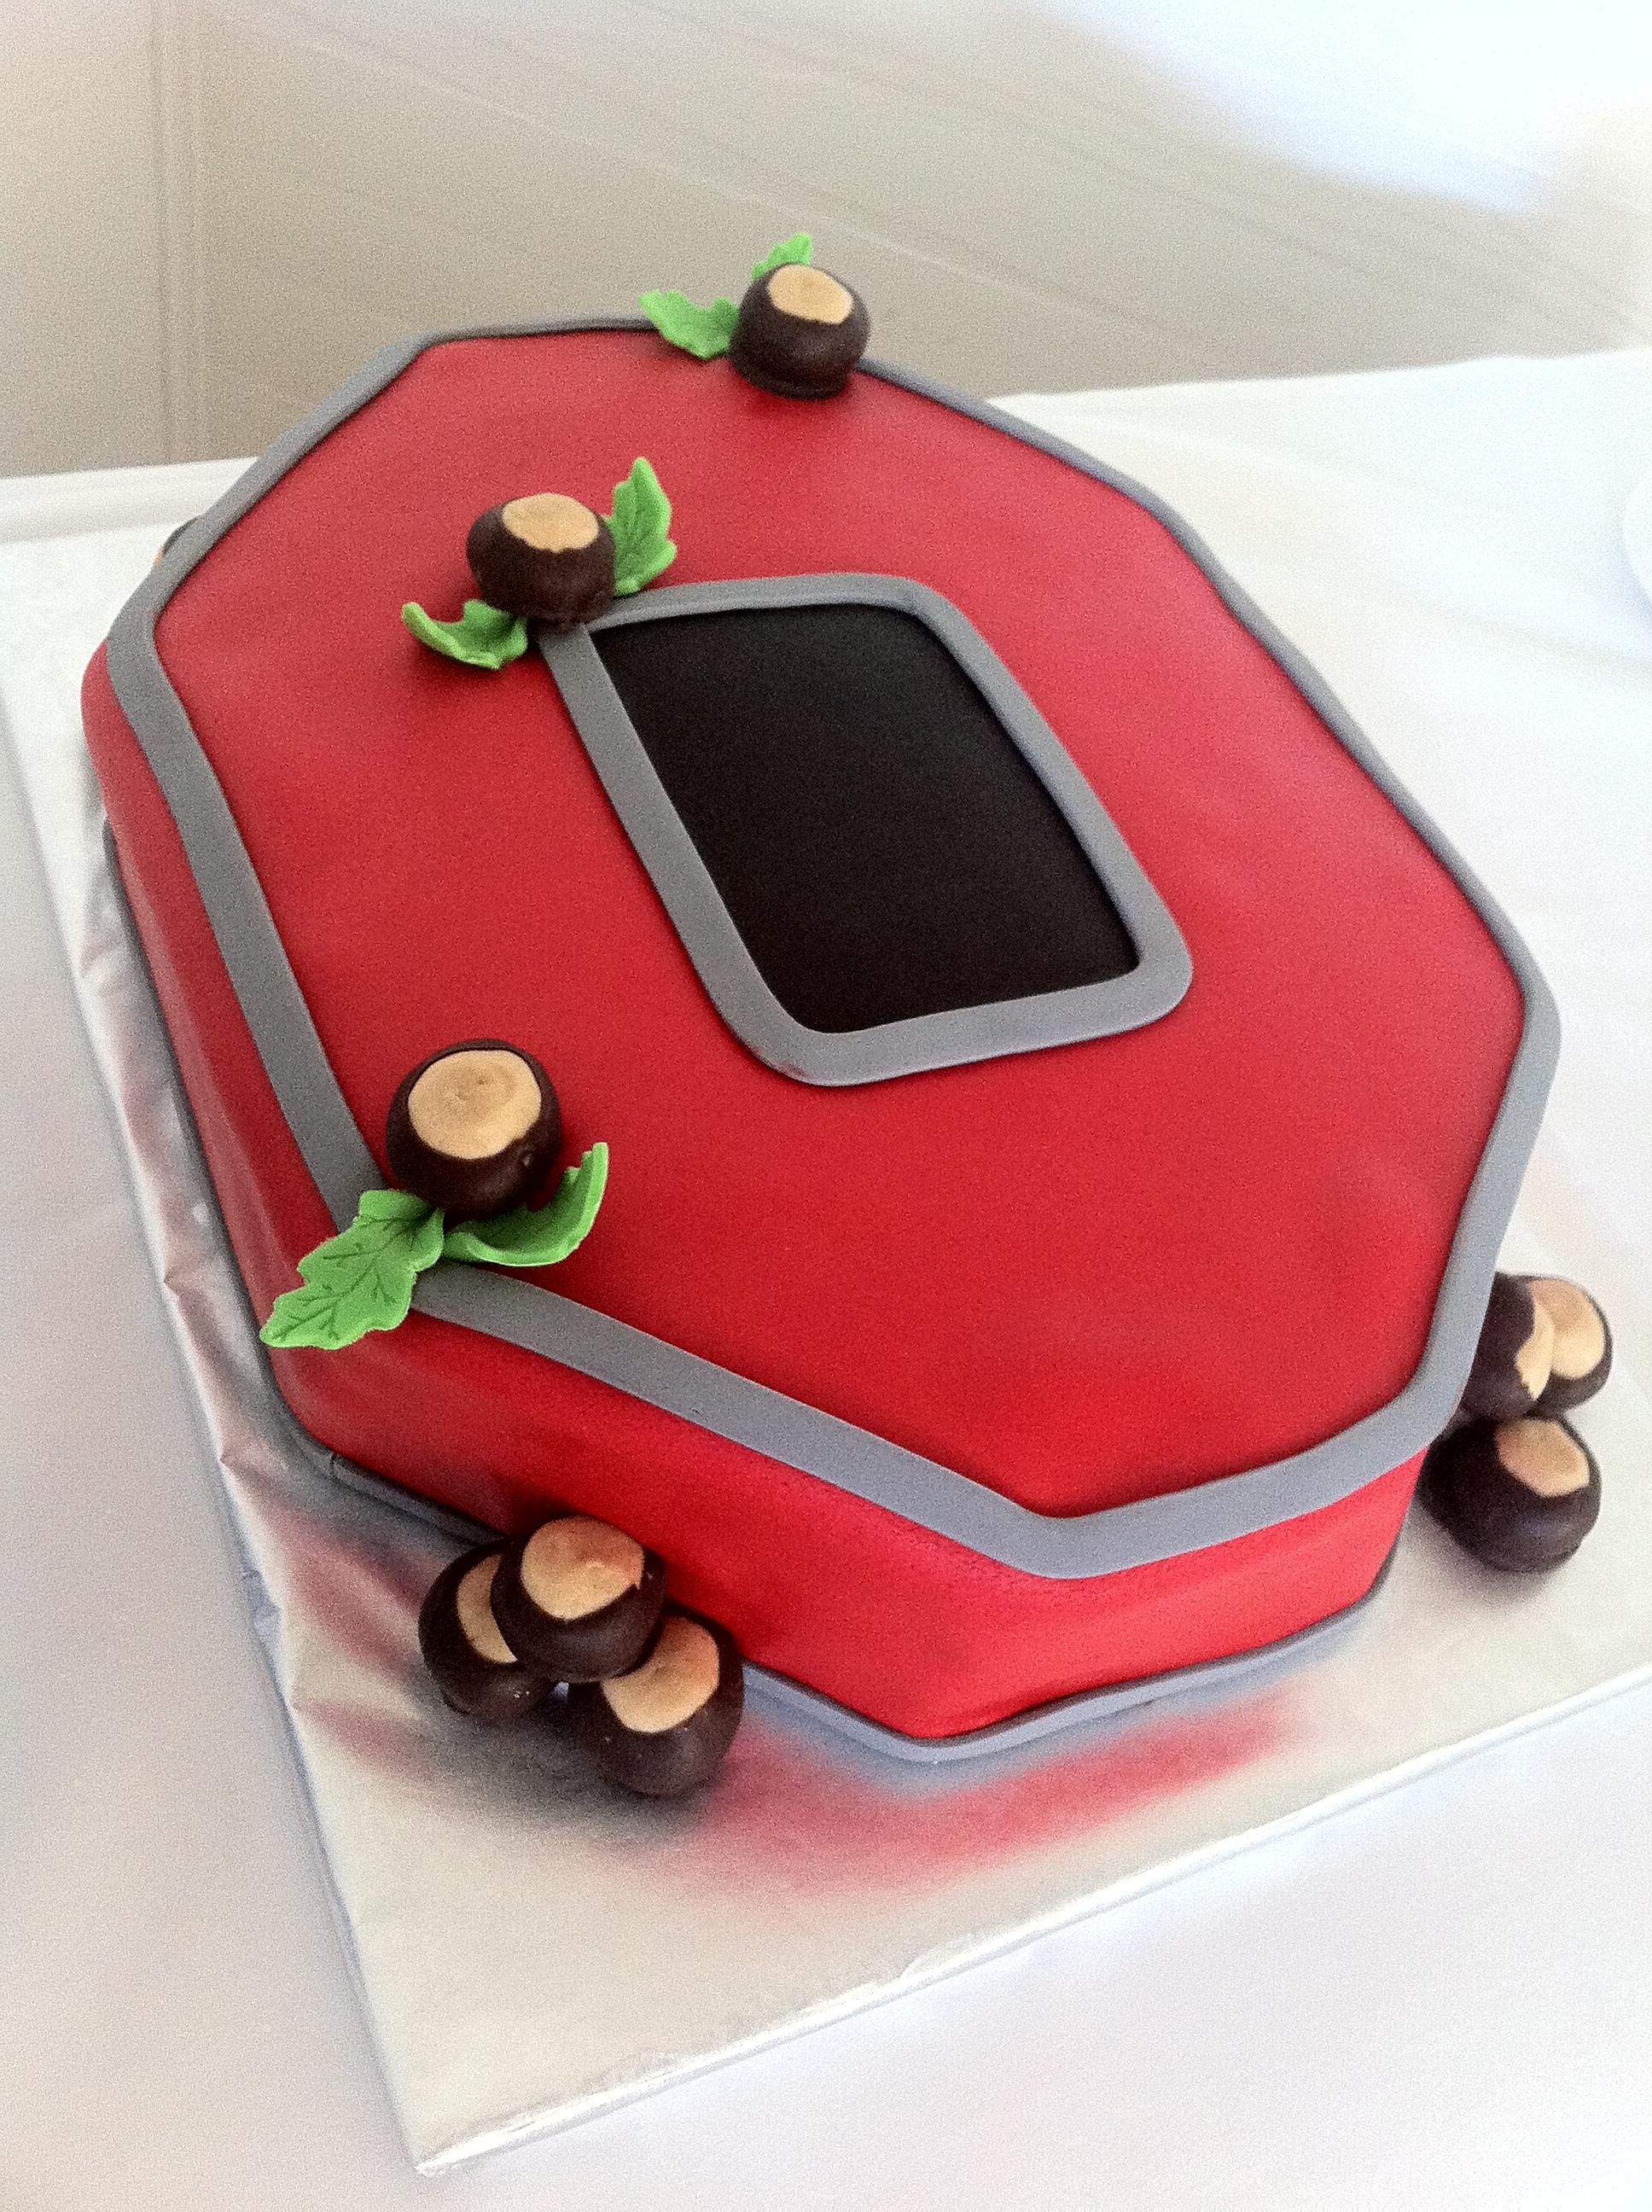 Fsu Cake Lolo S Cakes Amp Sweets